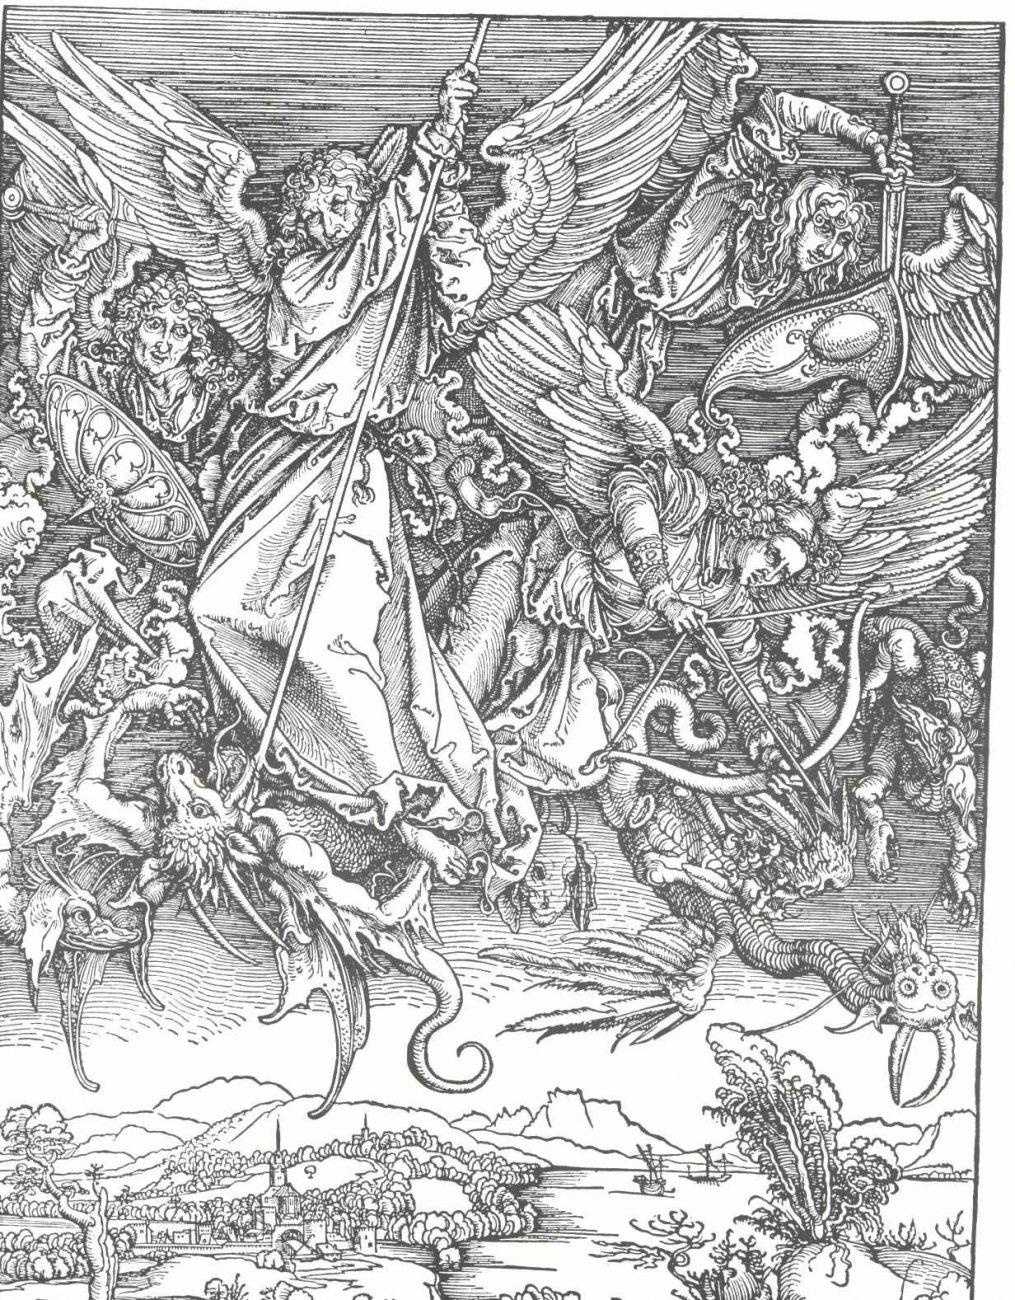 Dürer_-_Michaels_Kampf_mit_dem_Drachen.jpg